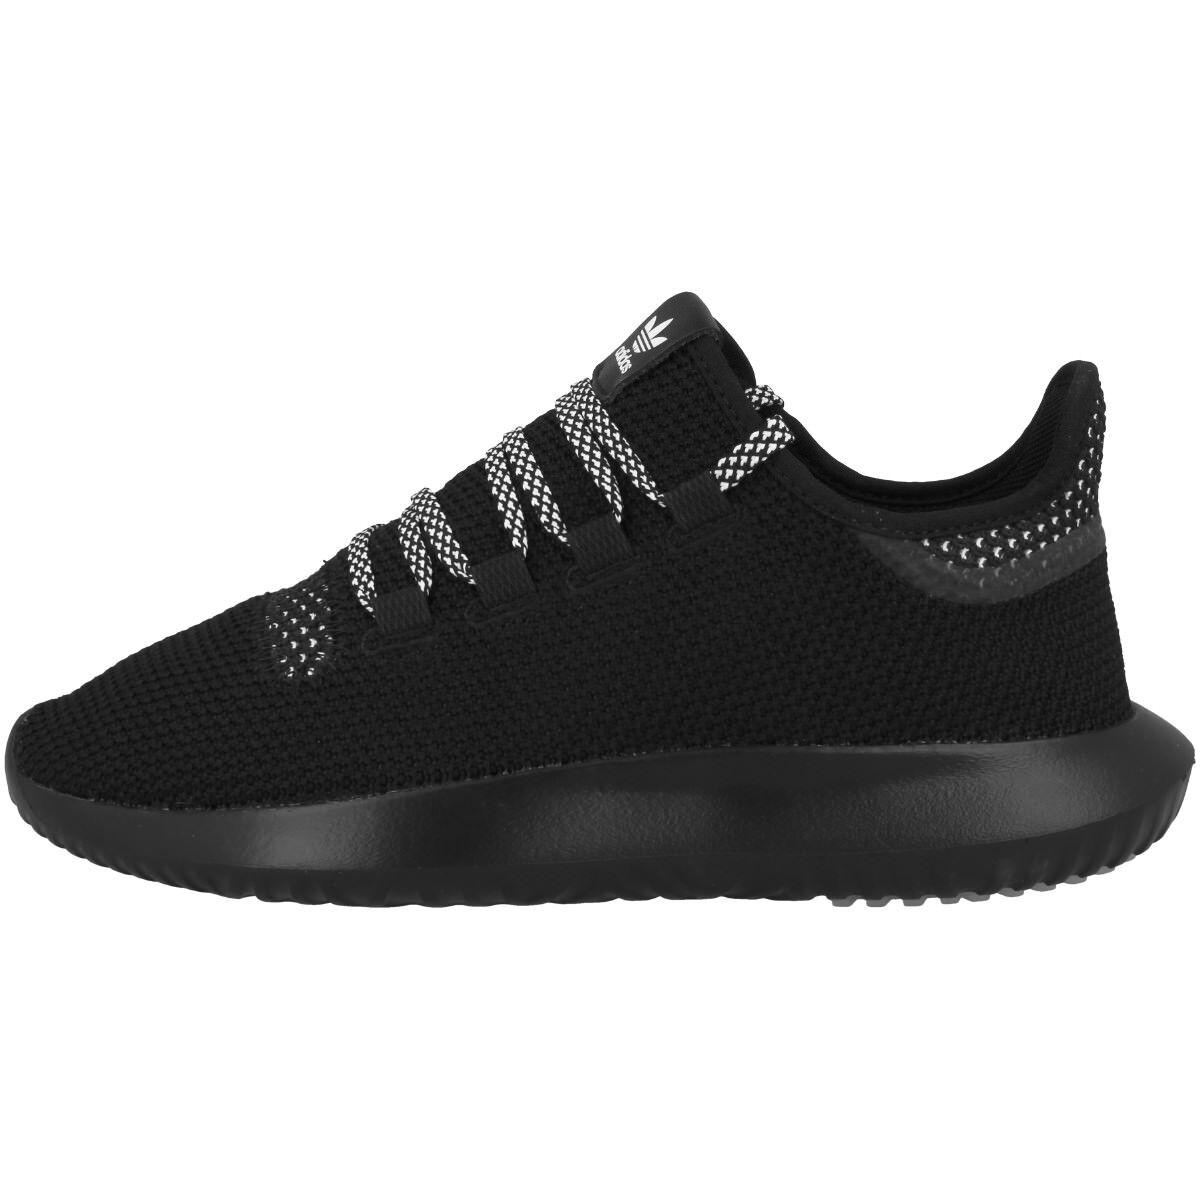 Adidas Tubular Shadow CK Men Schuhe Herren Turnschuhe Laufschuhe schwarz Weiß CQ0930 Wertvolle Boutique